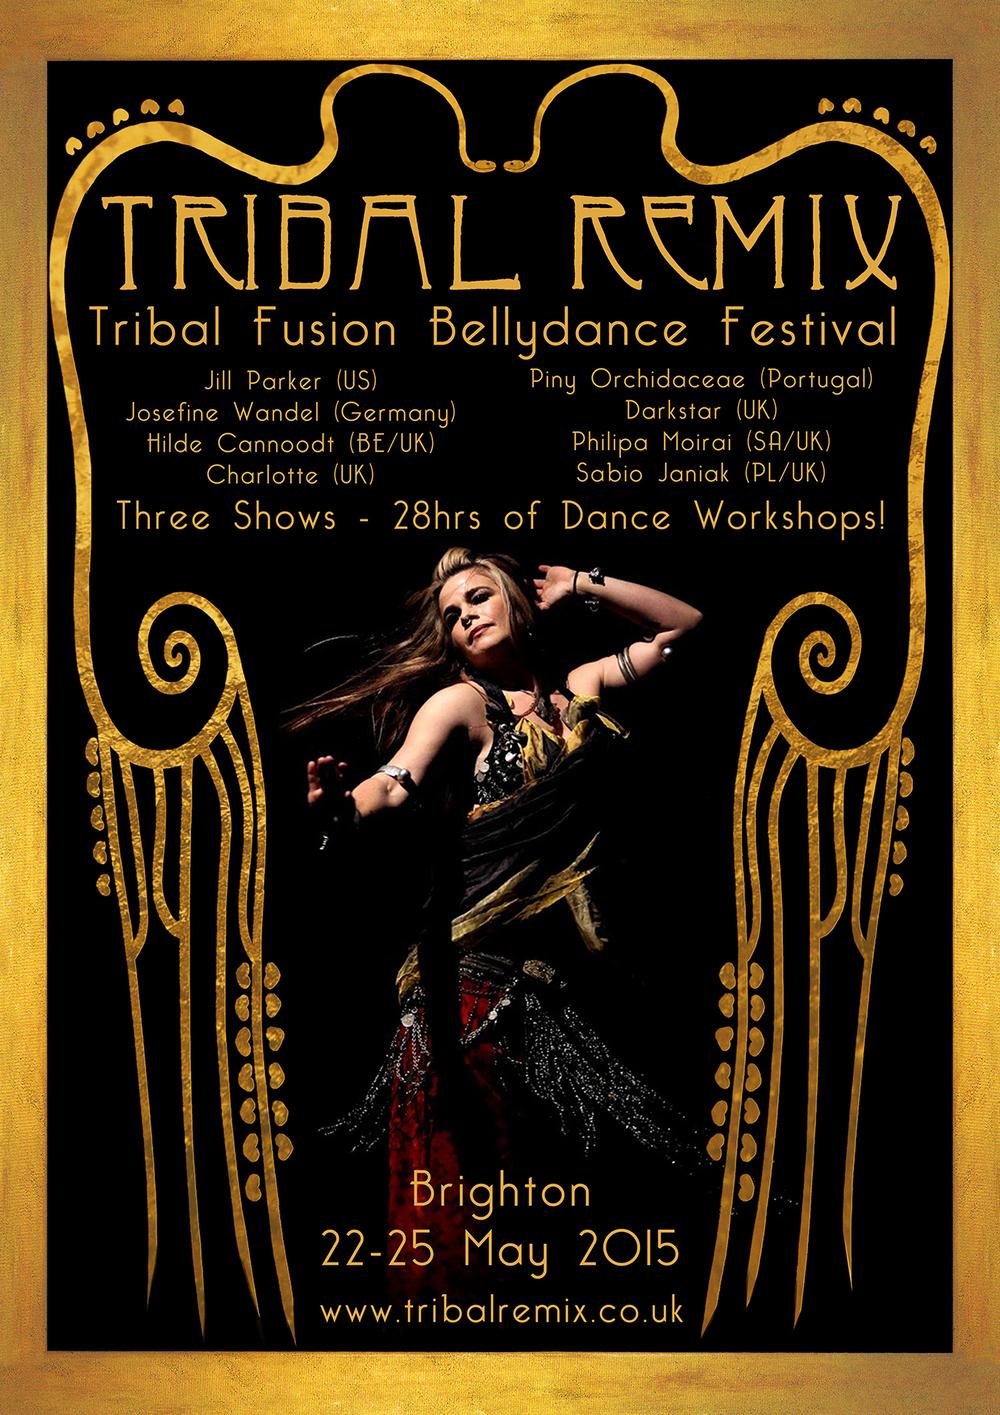 Tribal Remix Festival Poster print.jpg